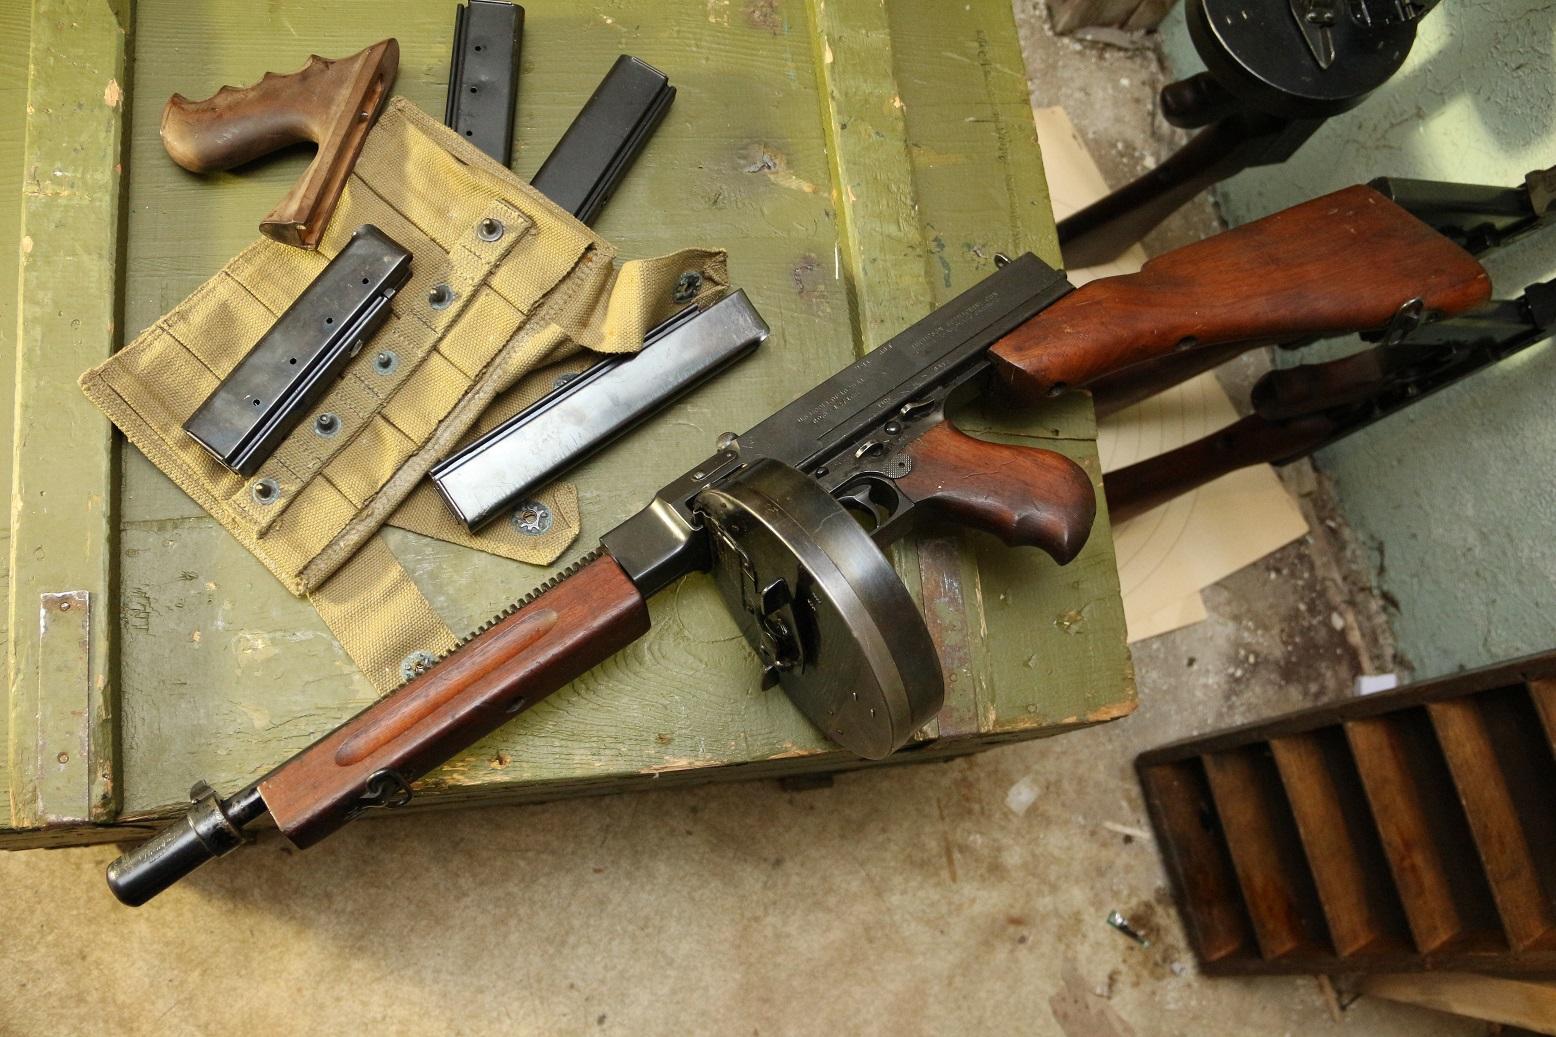 Фото Пистолет-пулемет Томпсон 1928а1 #427166, рифленый ствол